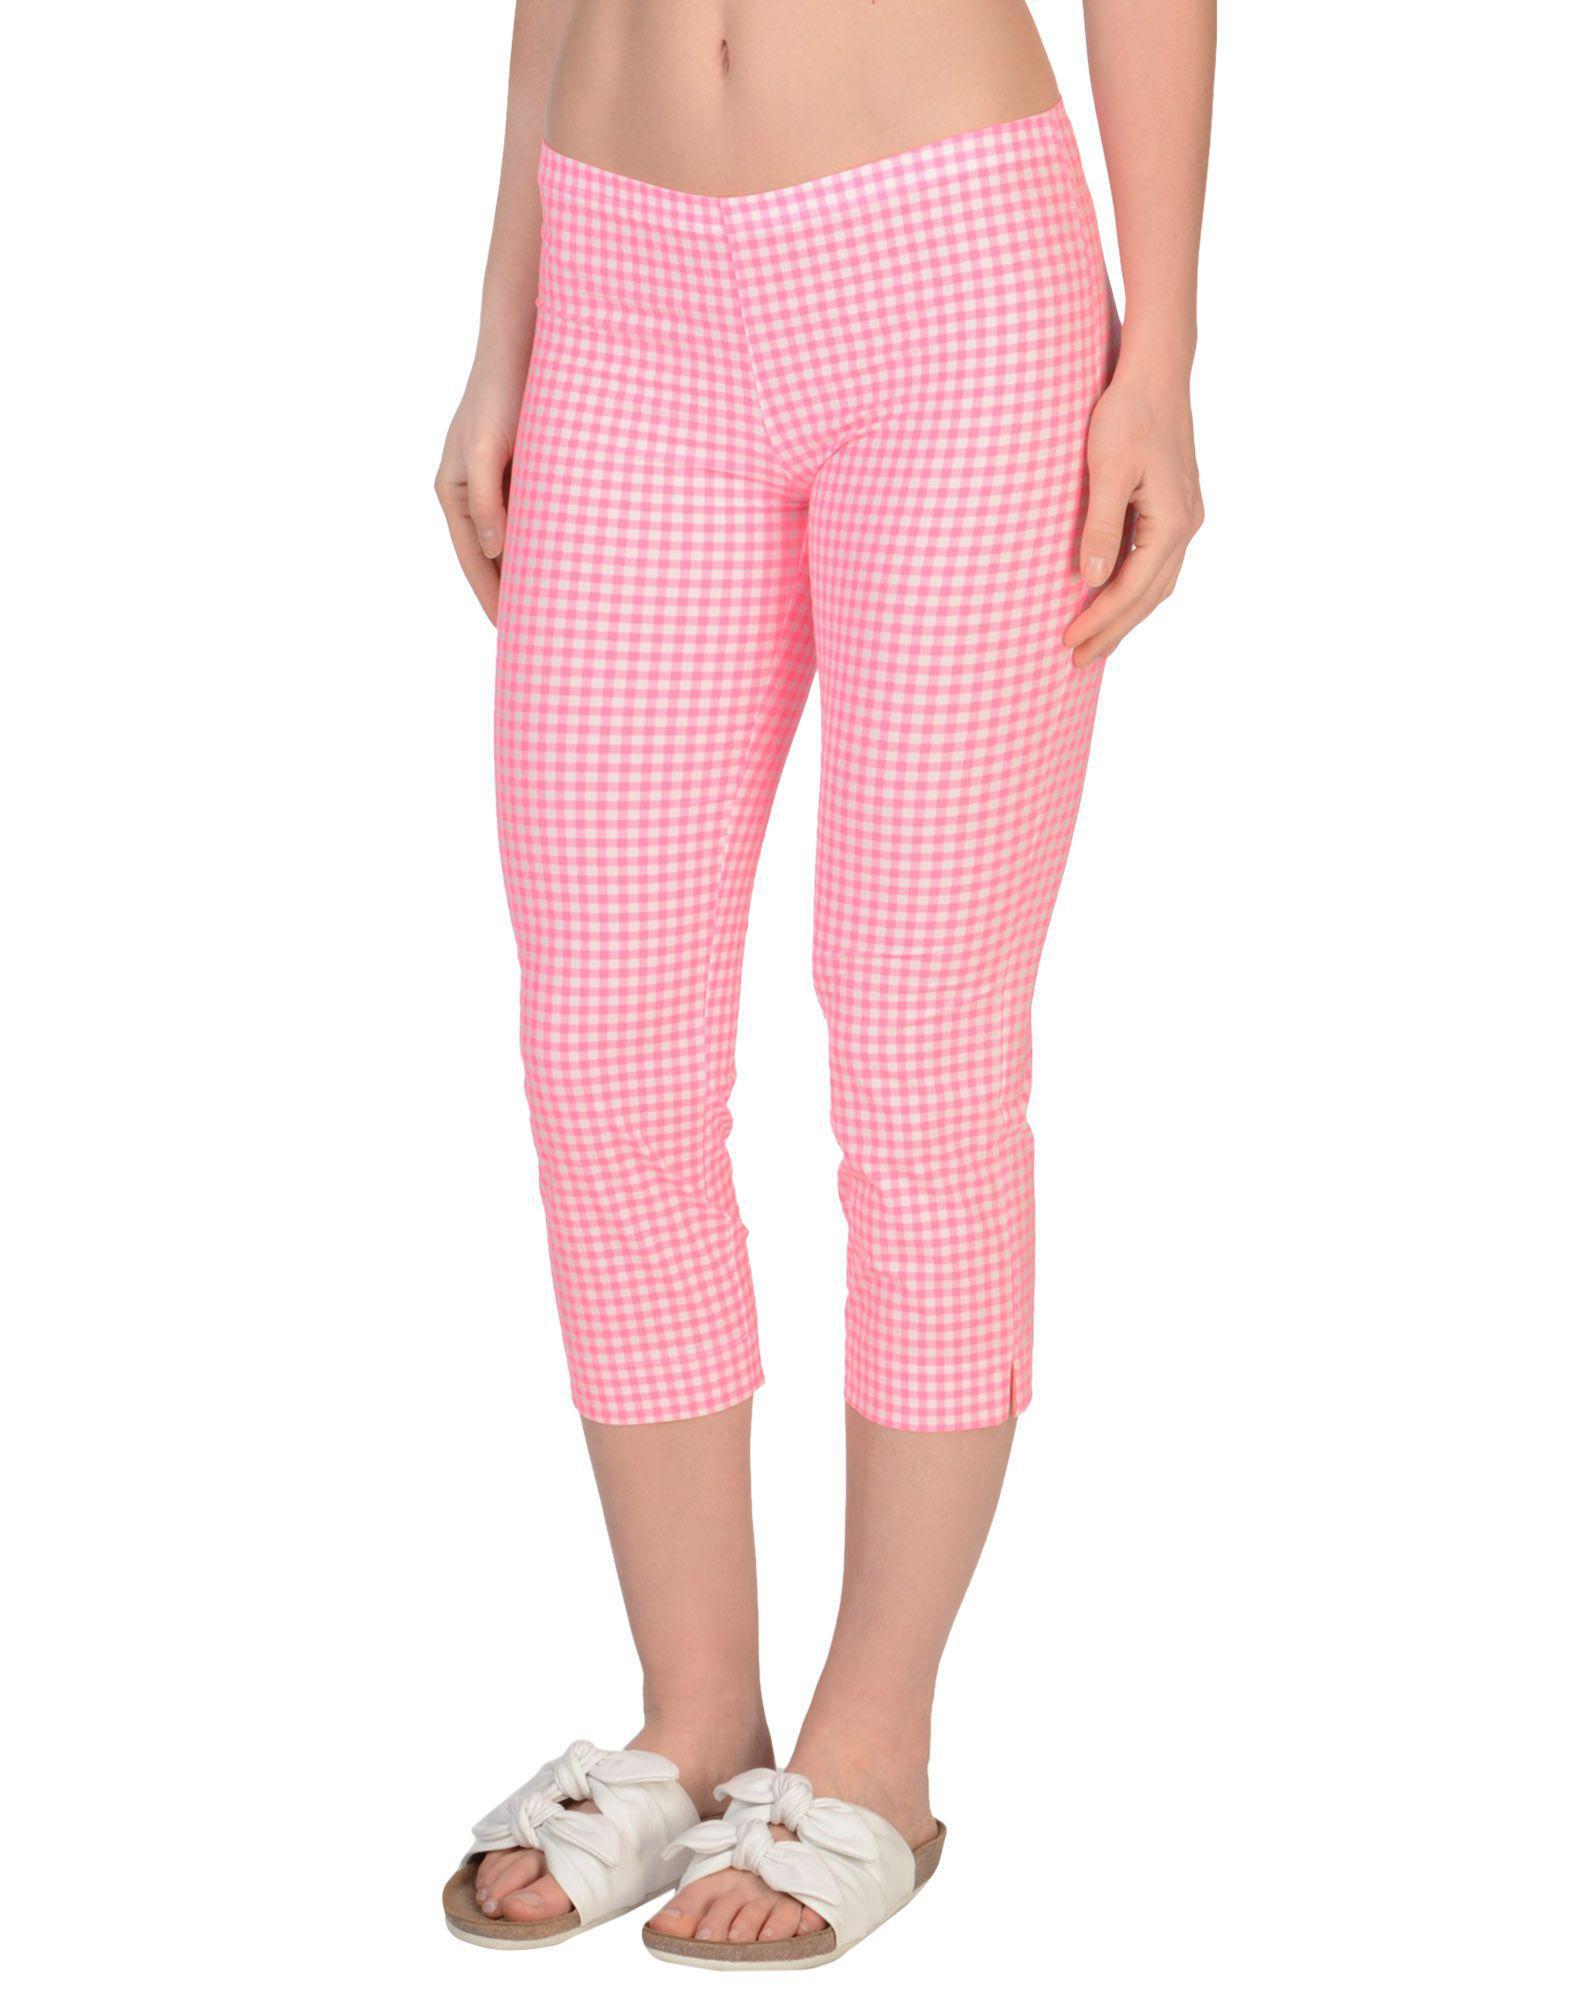 Pantalon - Short Blumarine v4wuPx8Q6y